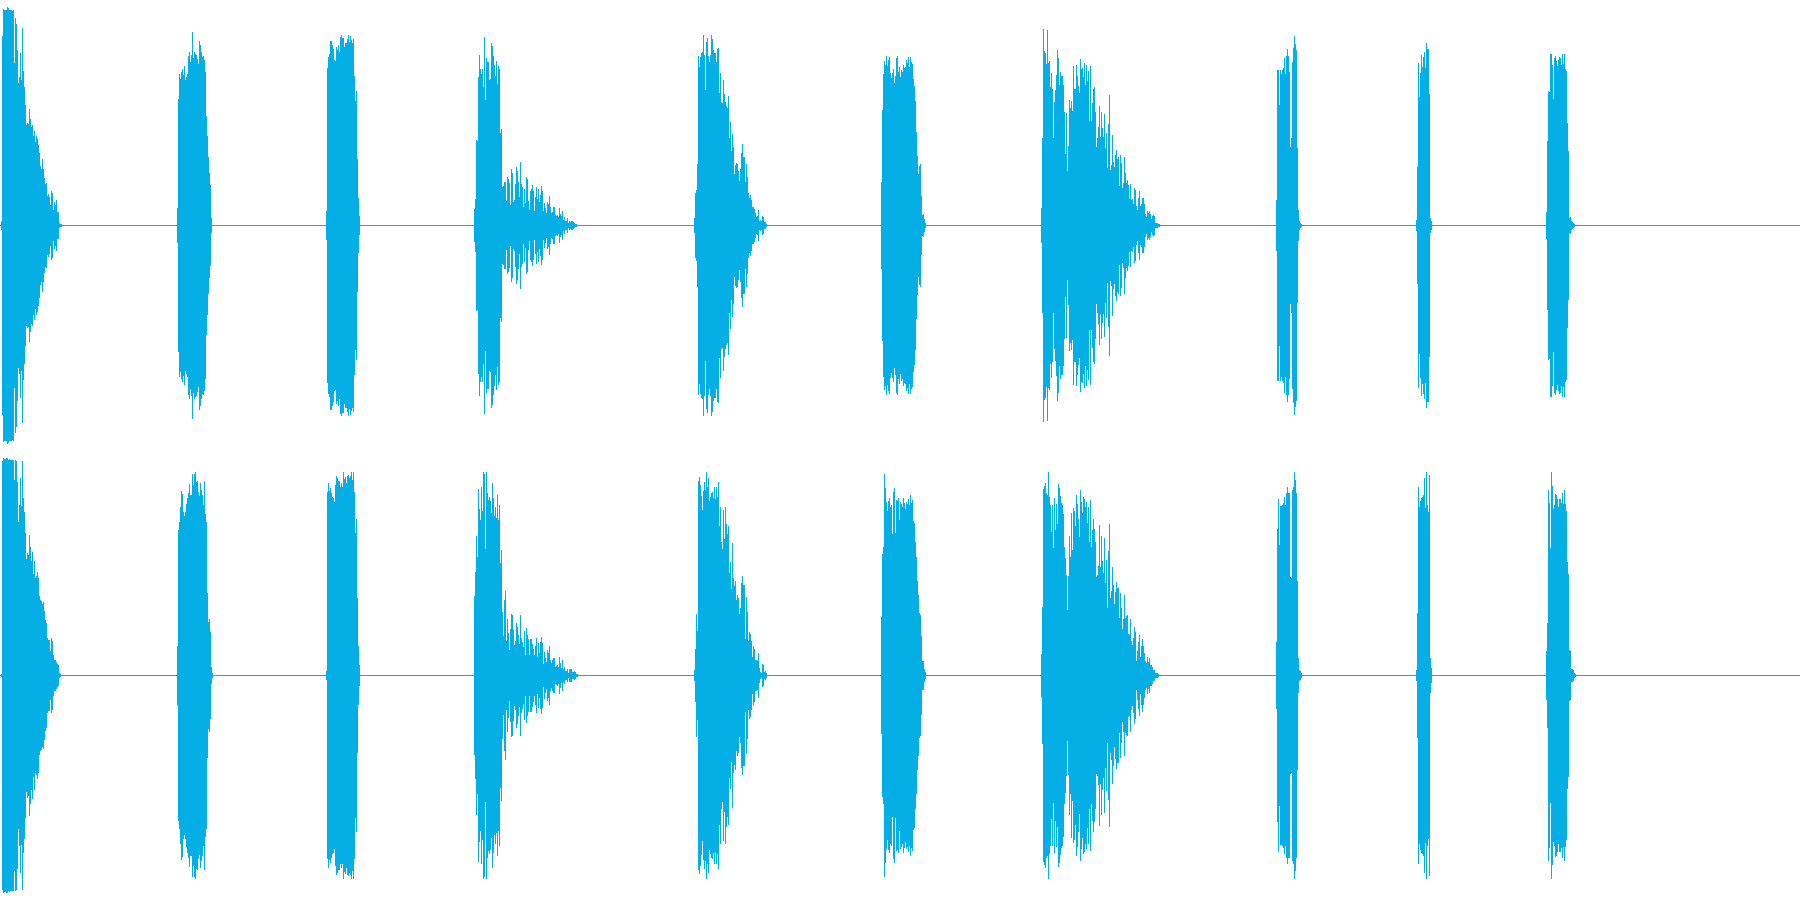 DJレーザーショット11-20の再生済みの波形